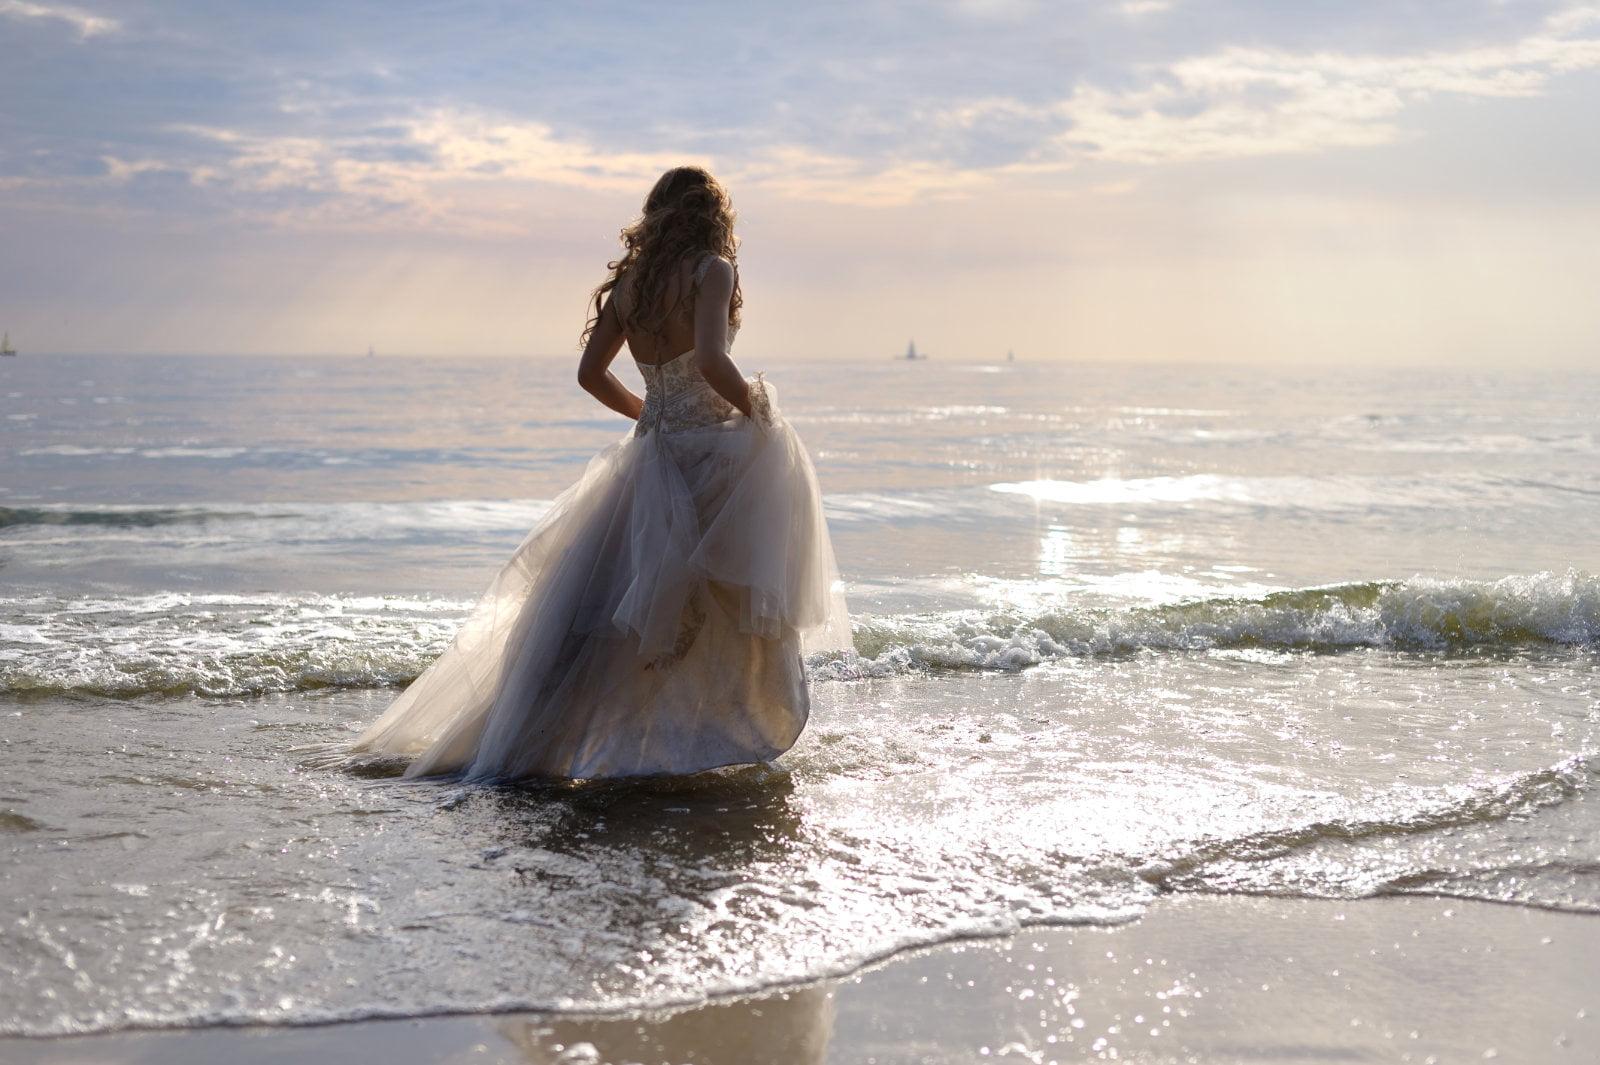 Tips on How to Take Perfect Beach Wedding Photos